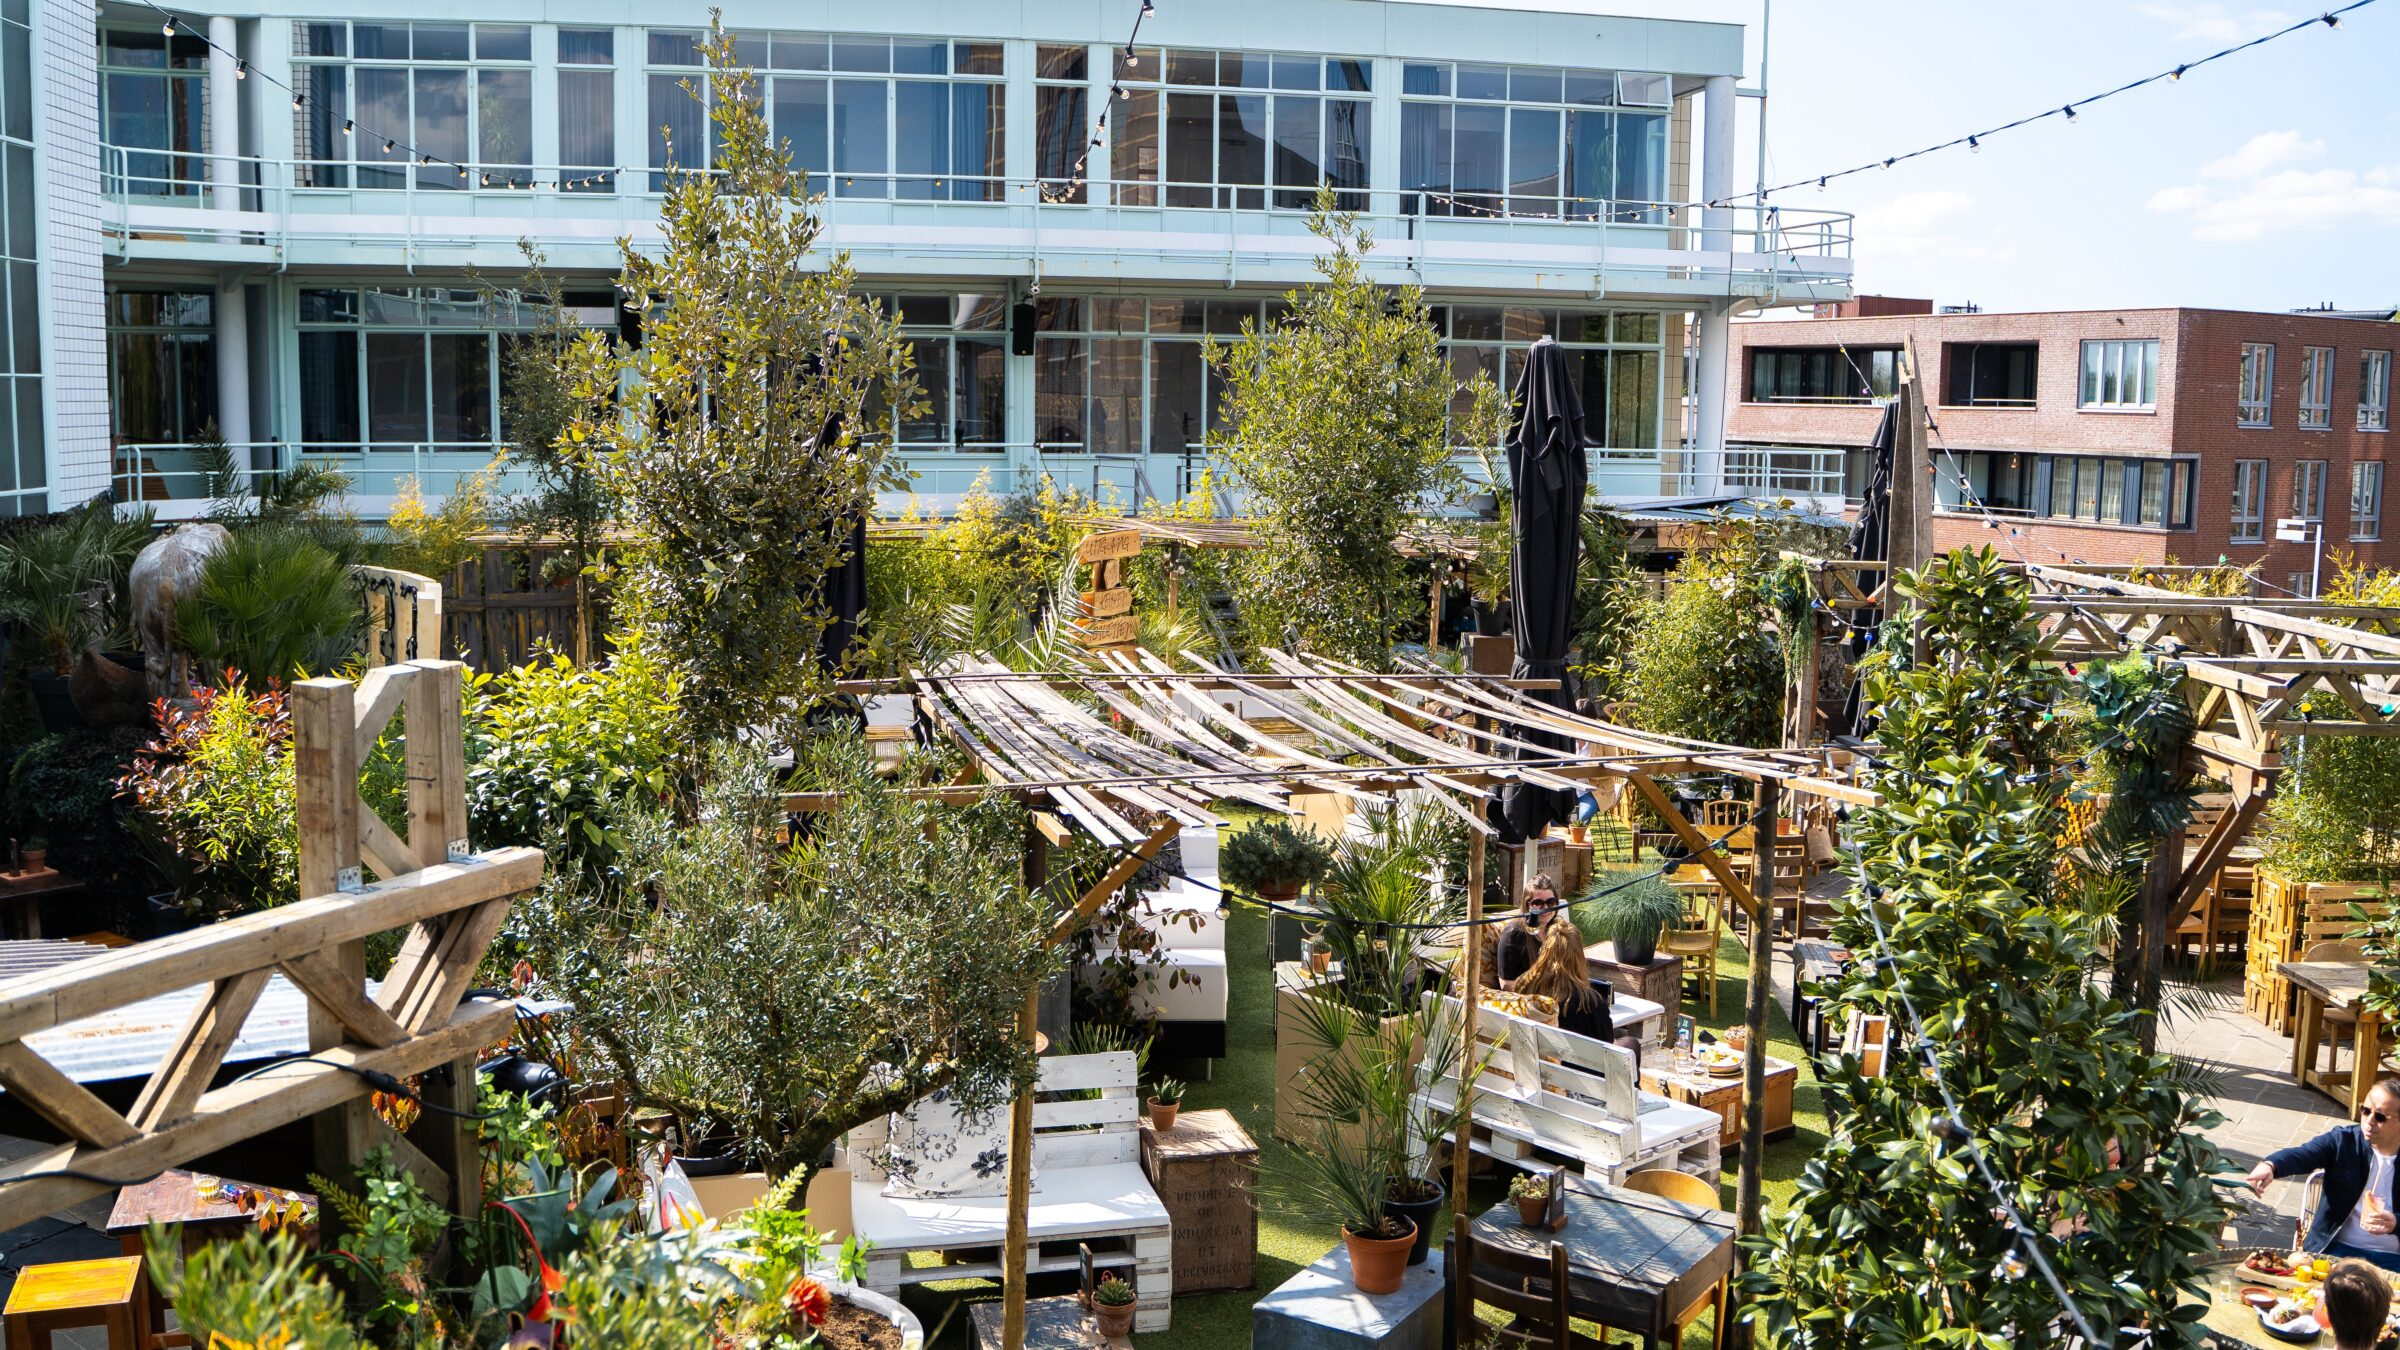 Roeff dakterras Gooiland Urban Jungle